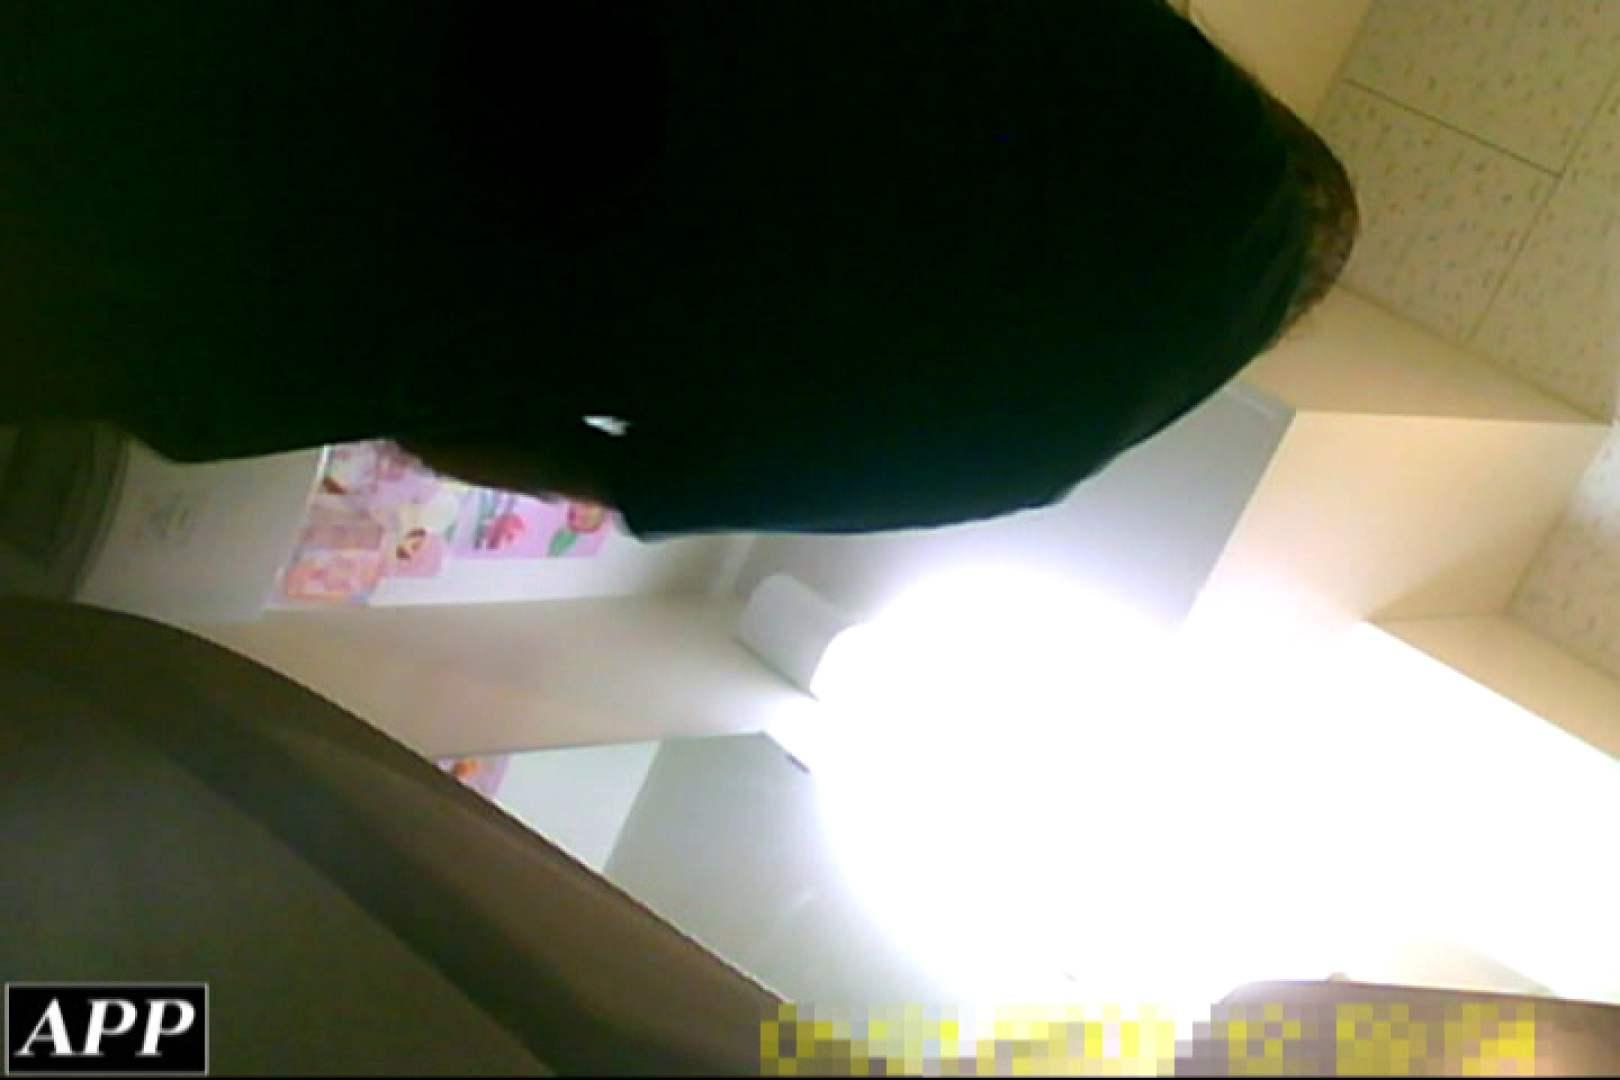 3視点洗面所 vol.109 丸見え オマンコ無修正動画無料 85画像 45